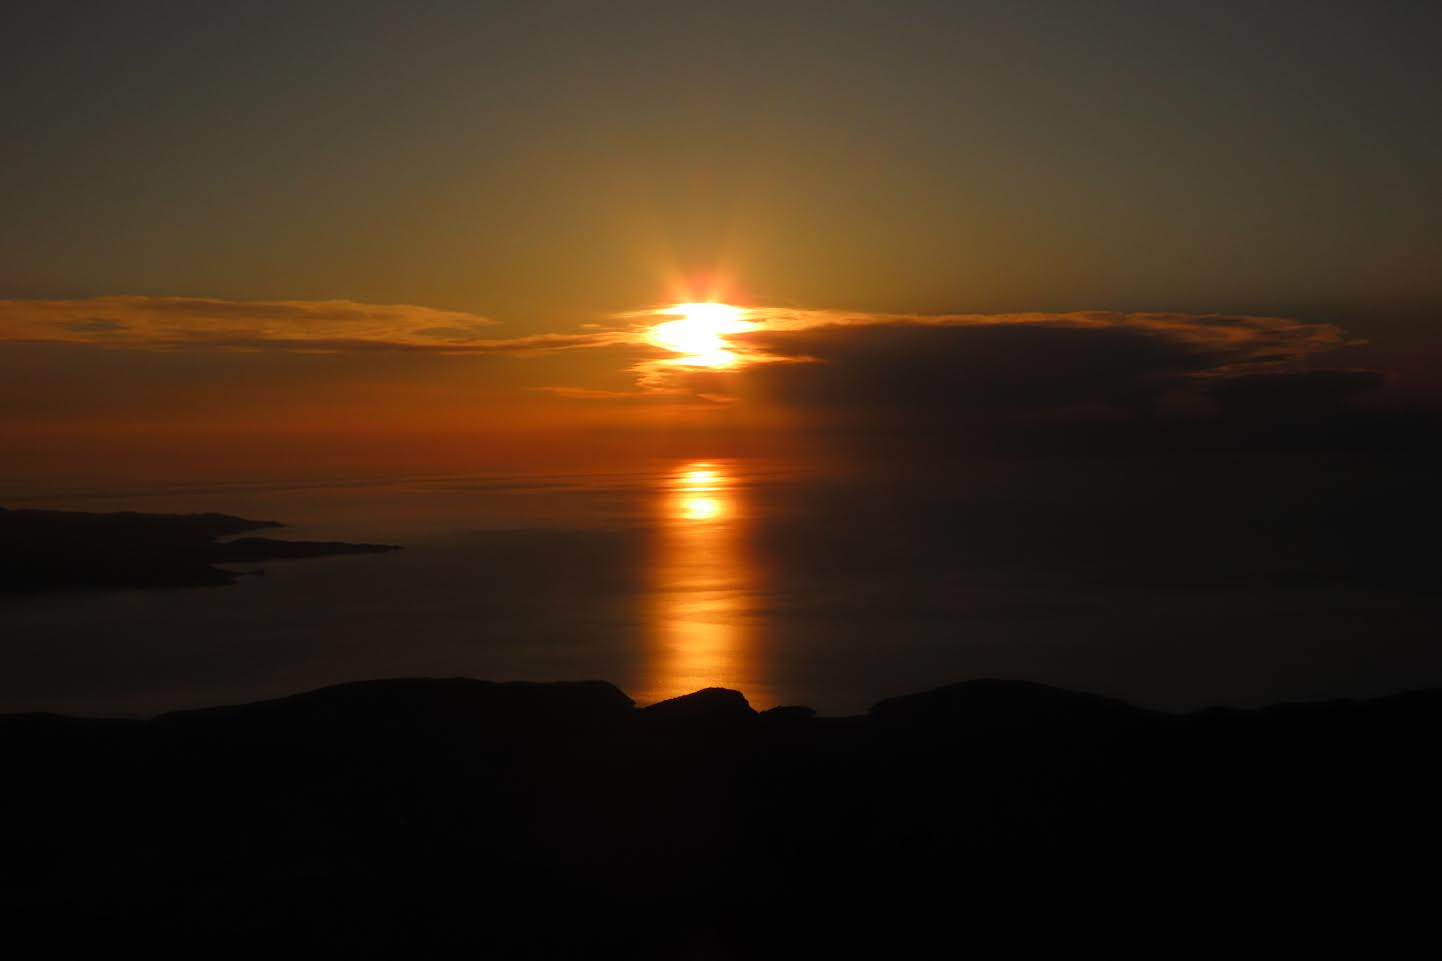 Coucher de soleil vu du Pignu (Marie-Thé Giacomi)